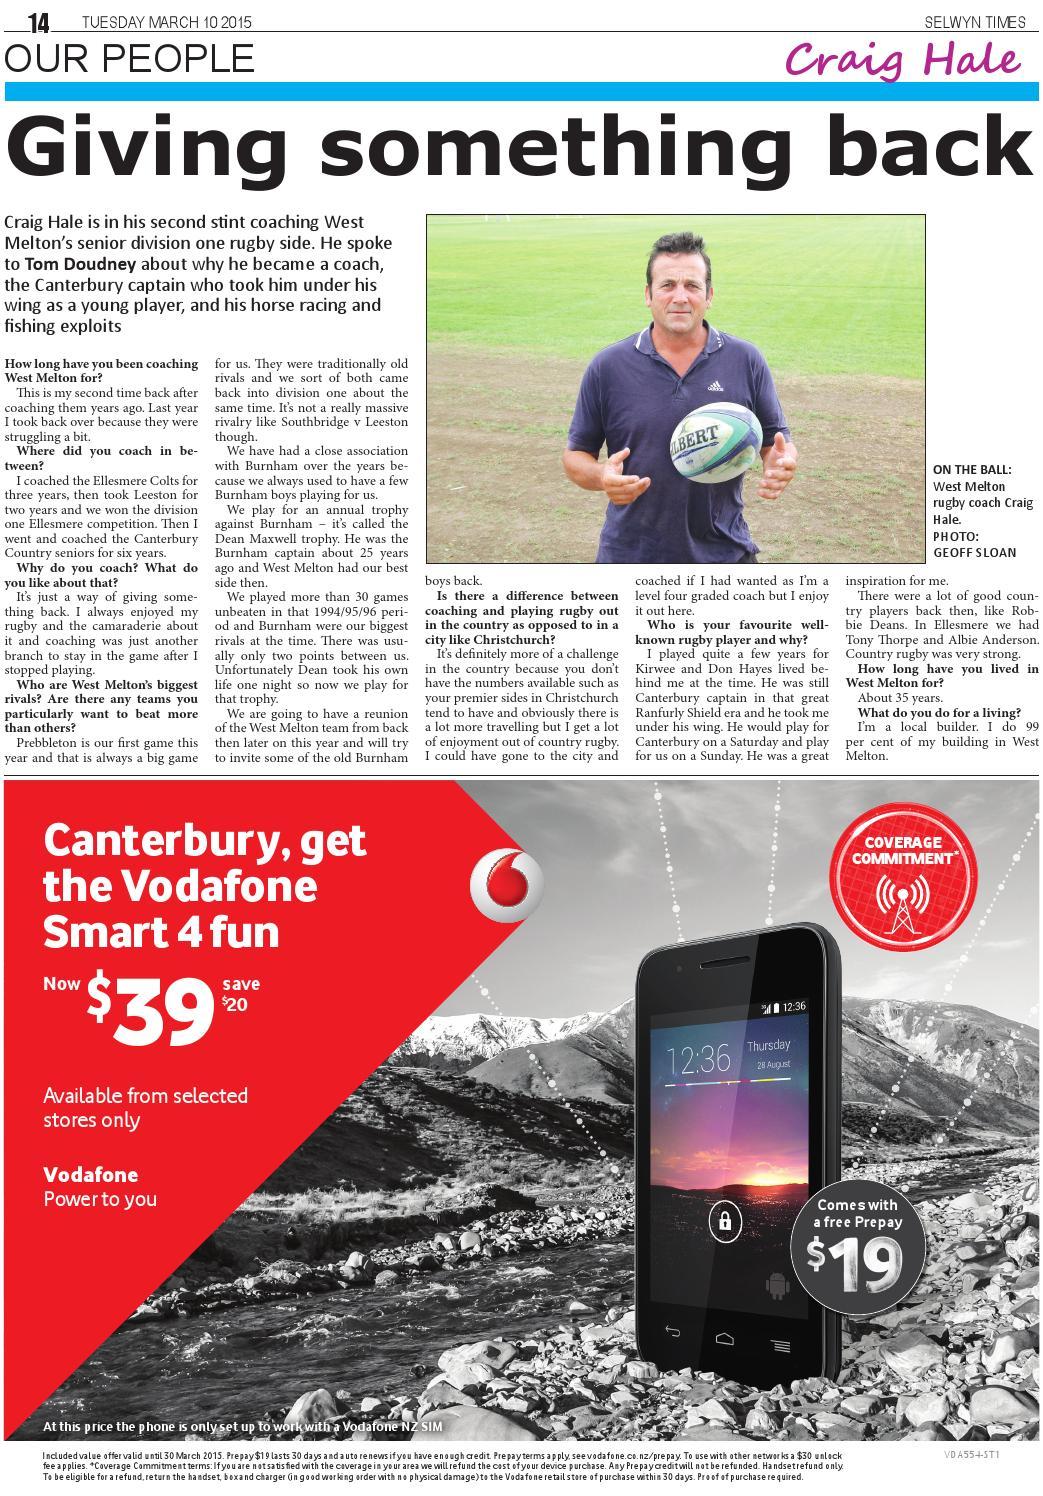 Selwyn Times 10-03-15 by Local Newspapers - issuu